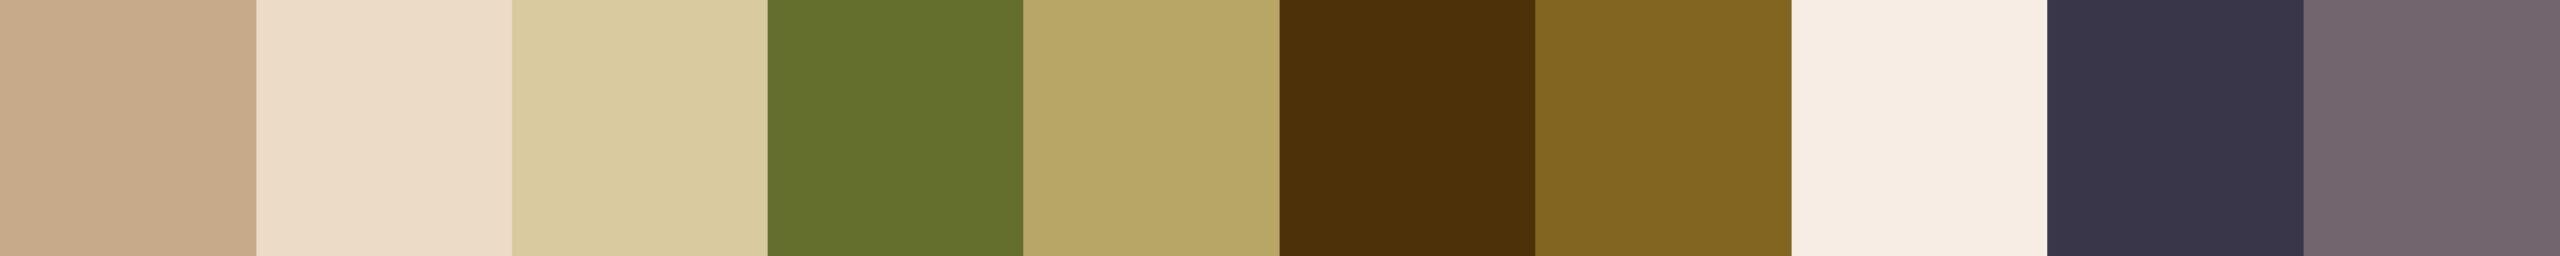 173 Hesidelia Color Palette